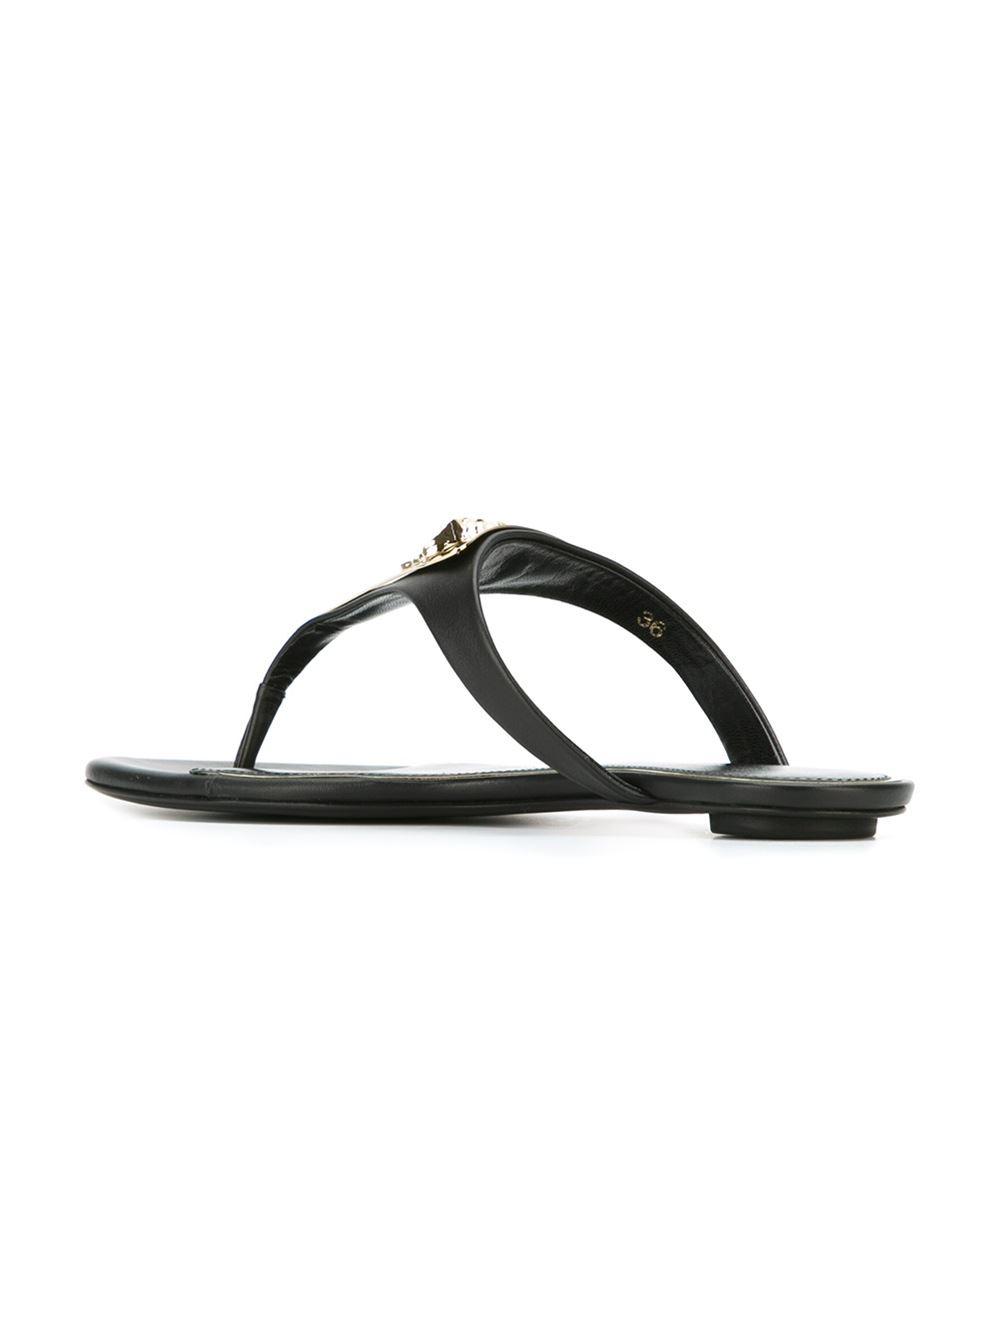 99b1439efbb Lyst - Versace  medusa Palazzo  Thong Sandals in Black